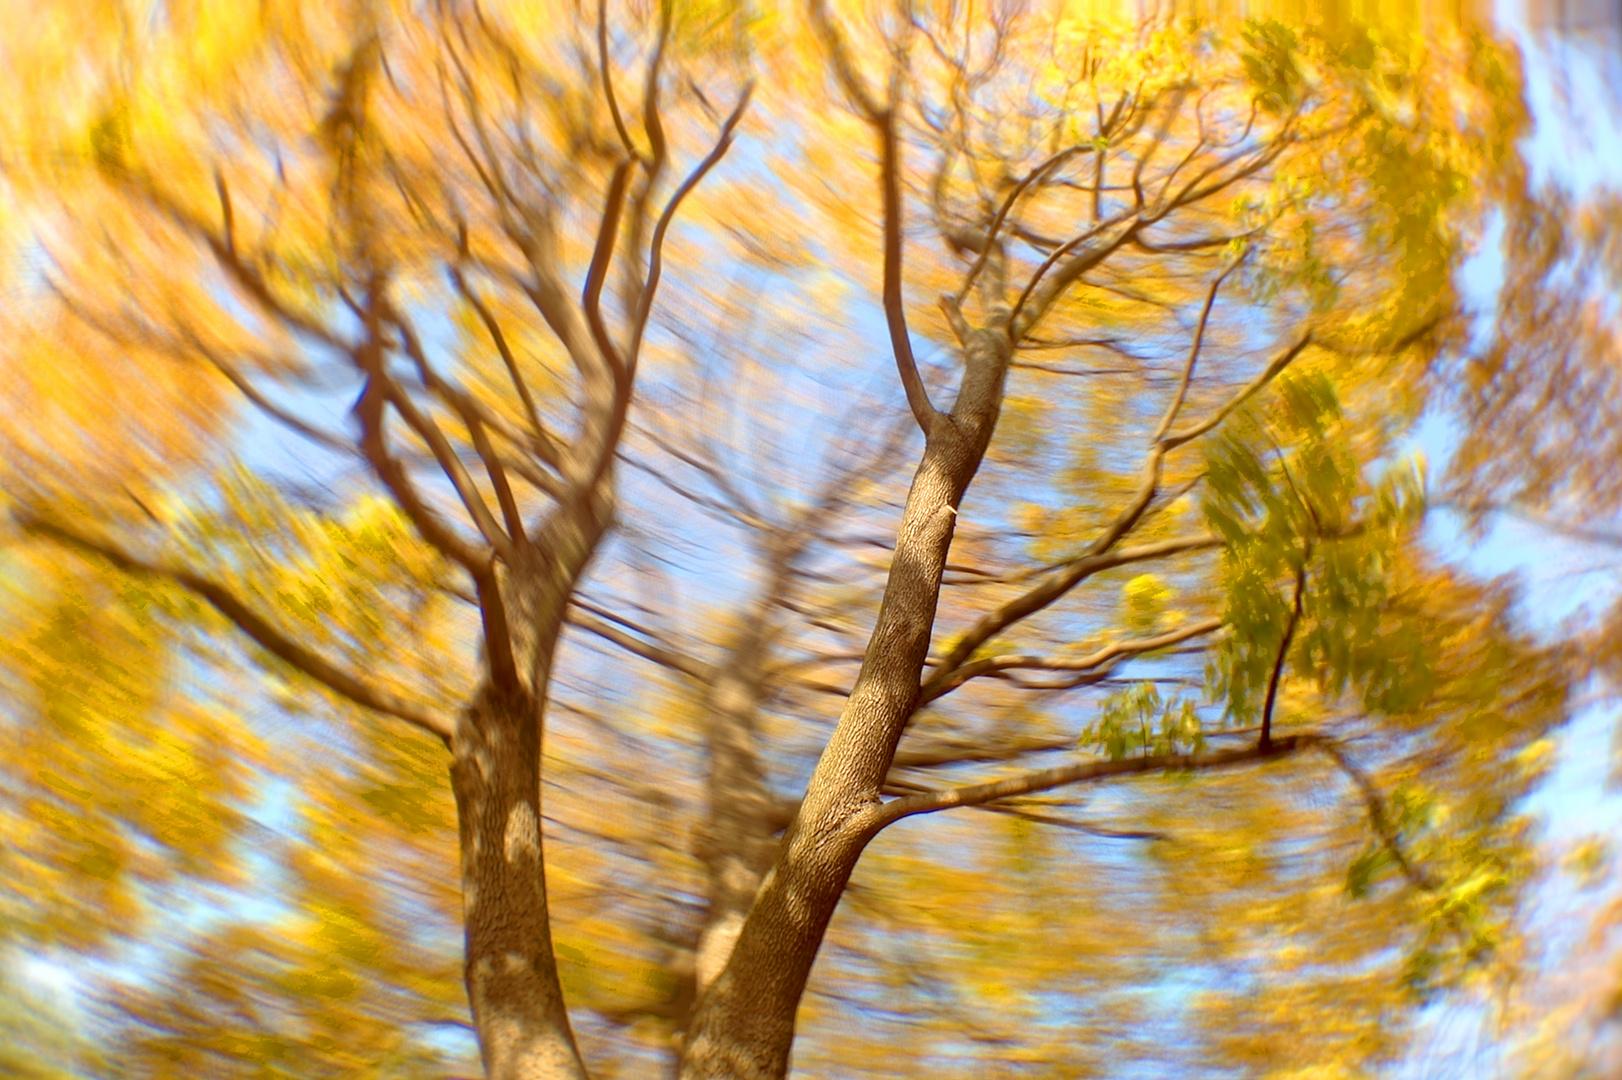 Tree in motion